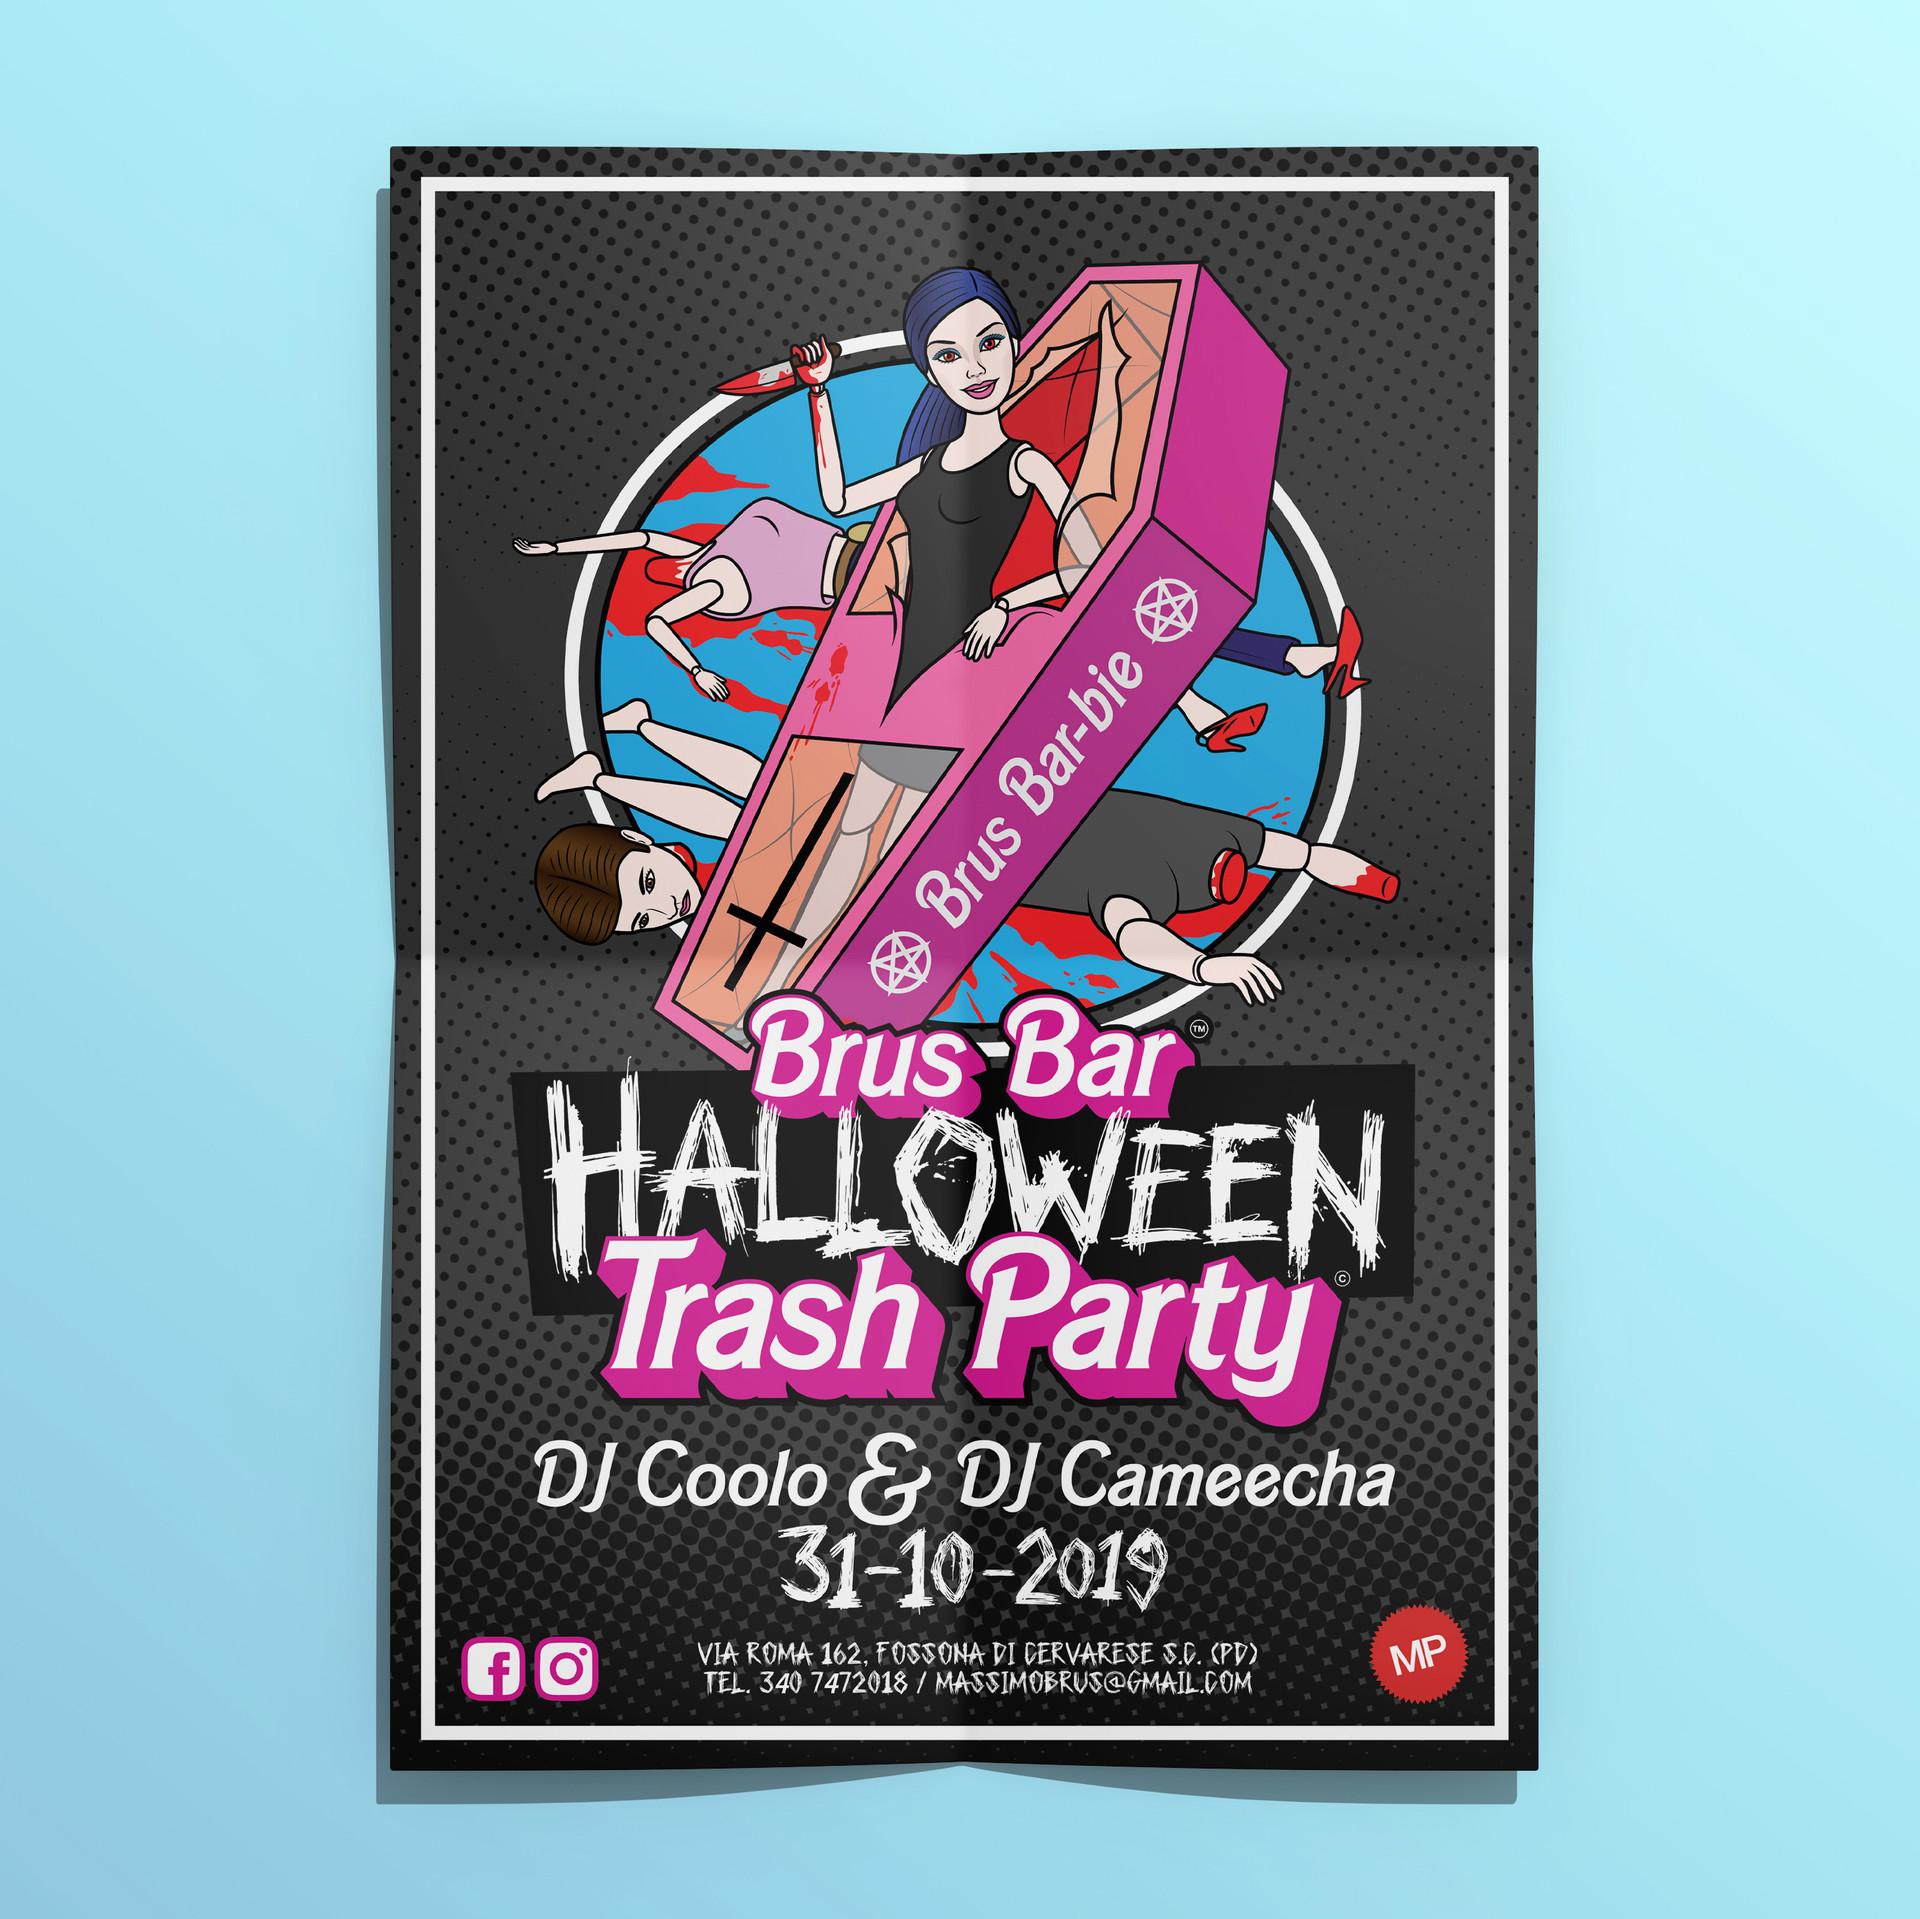 Brus Bar Halloween Trash Party 2019 Poster - MP Grafica